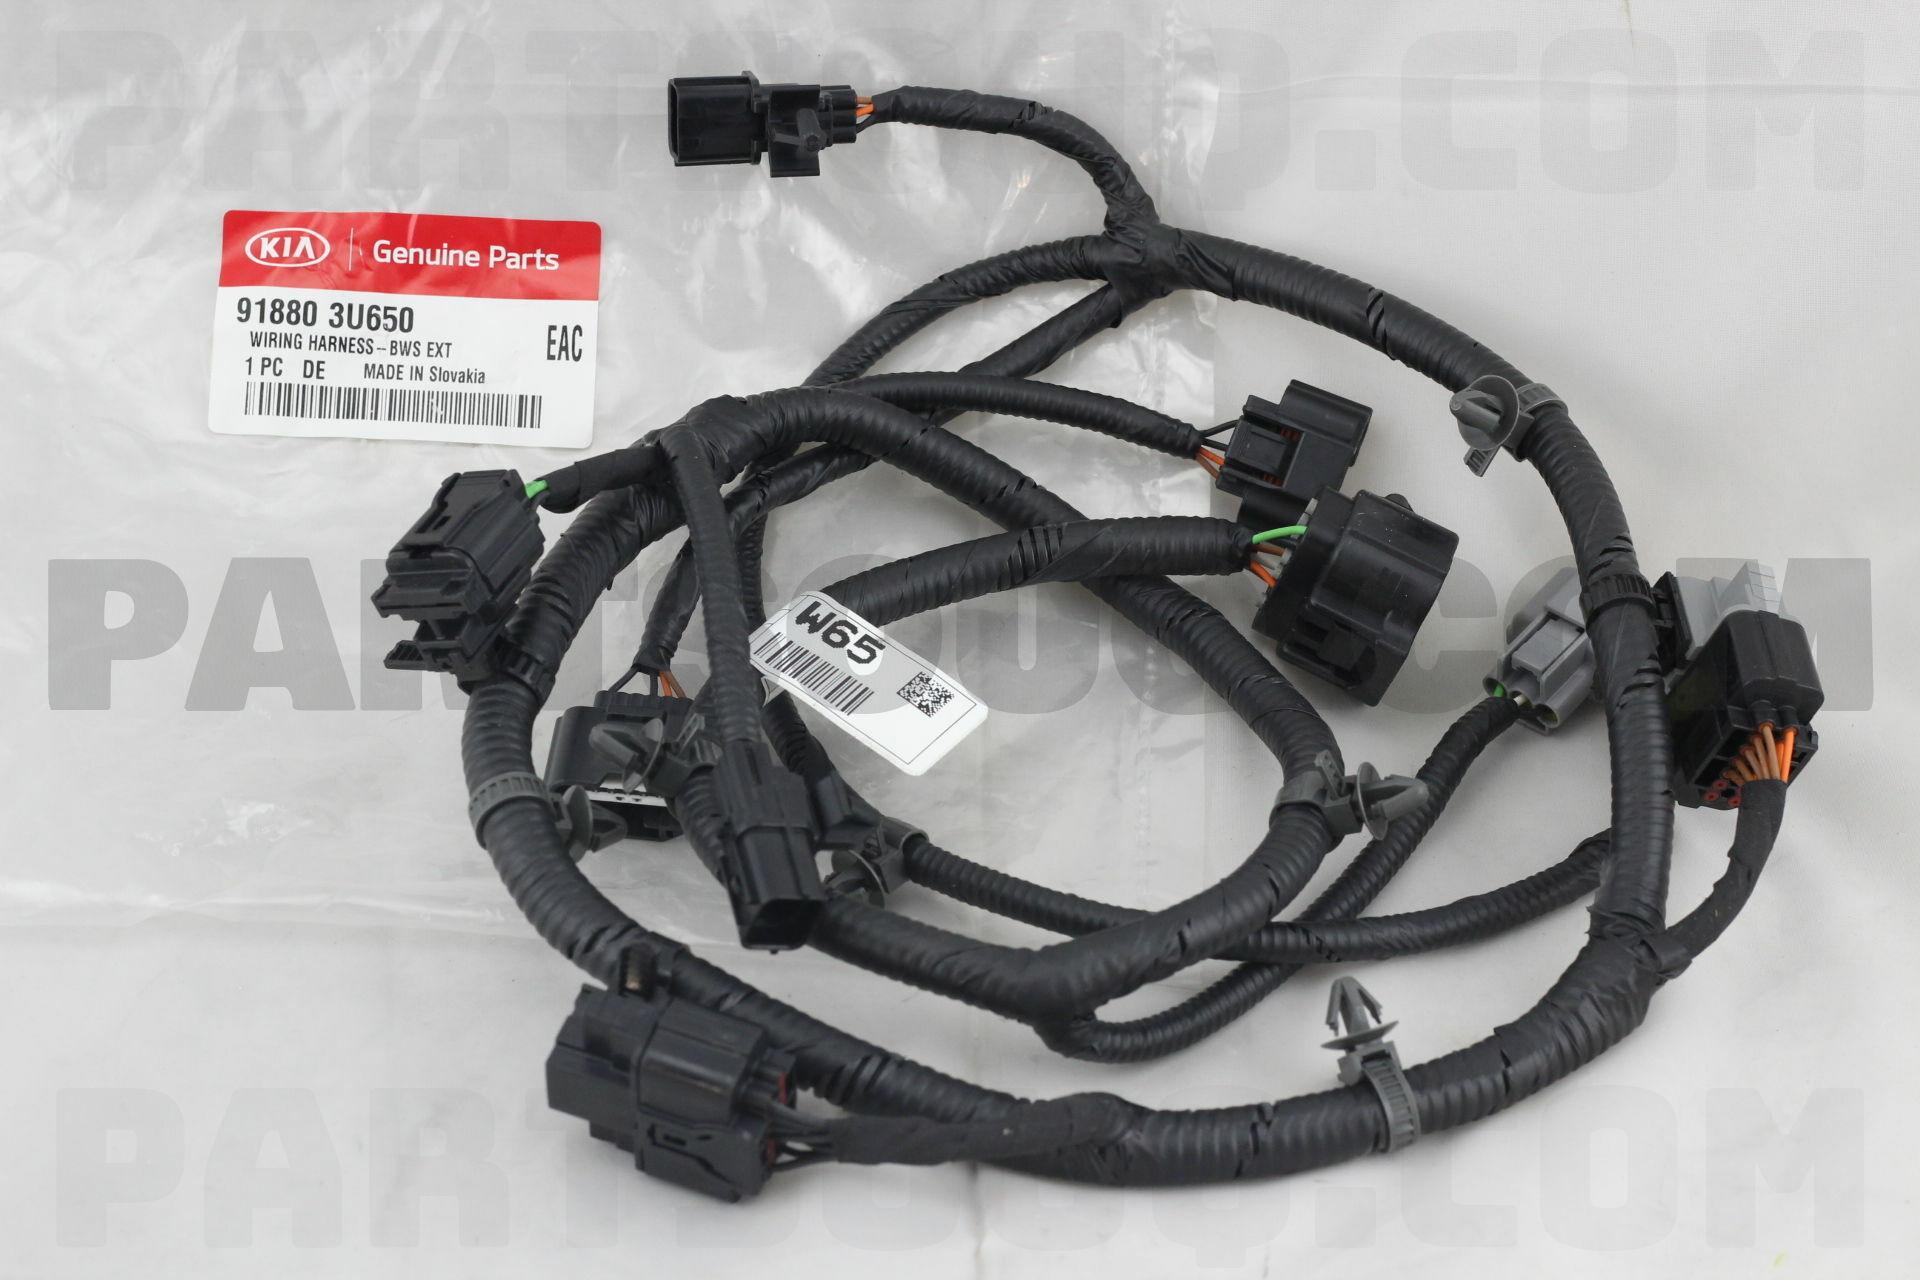 918803u650 Hyundai Kia Wiring Harness Bws Ext Price 9188 Harnesses